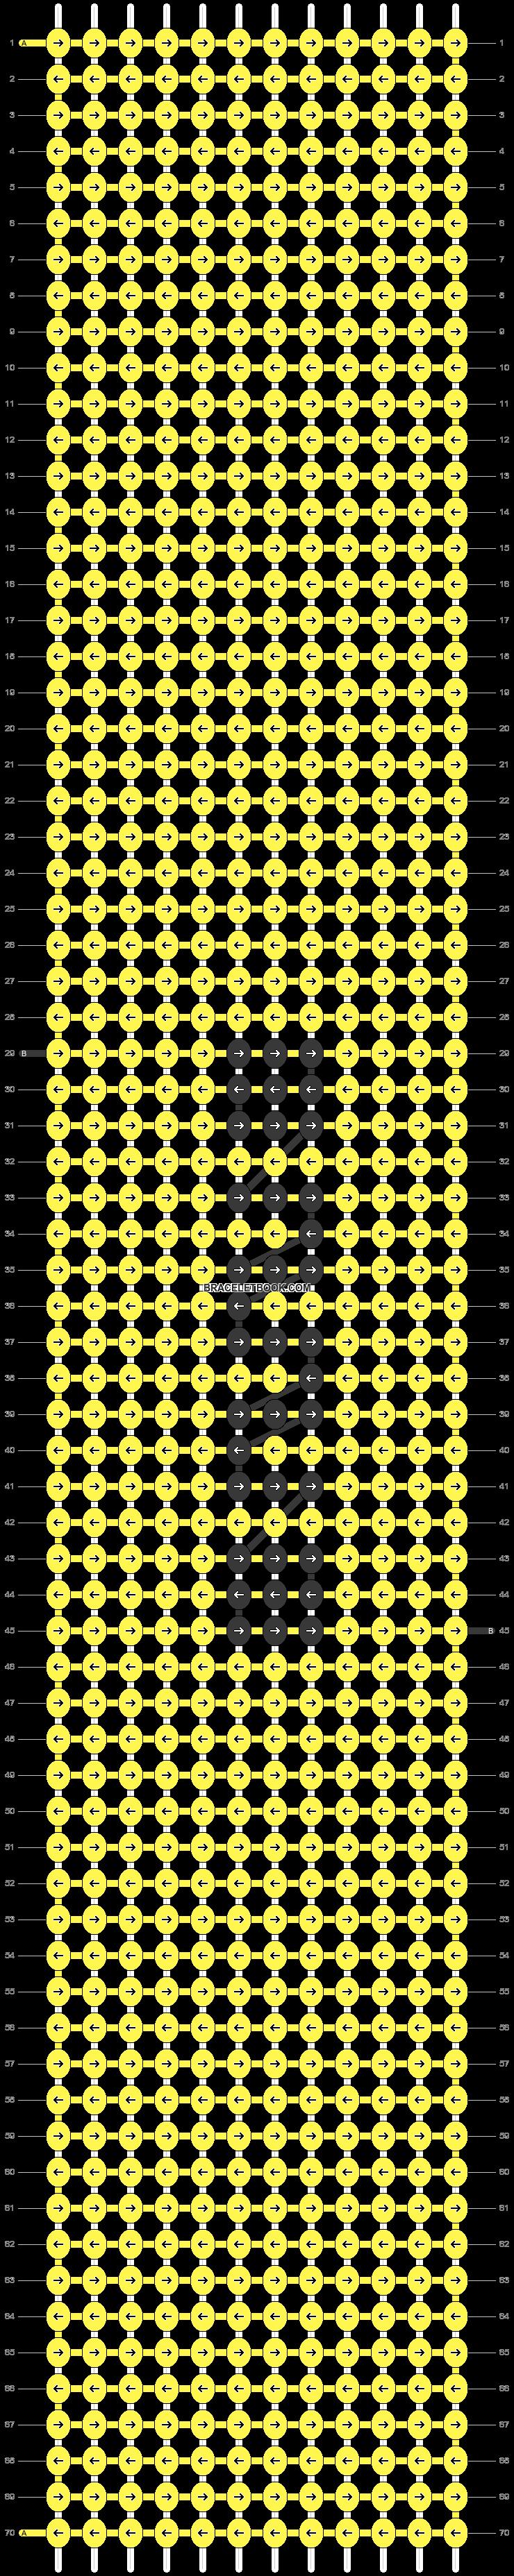 Alpha pattern #47675 pattern